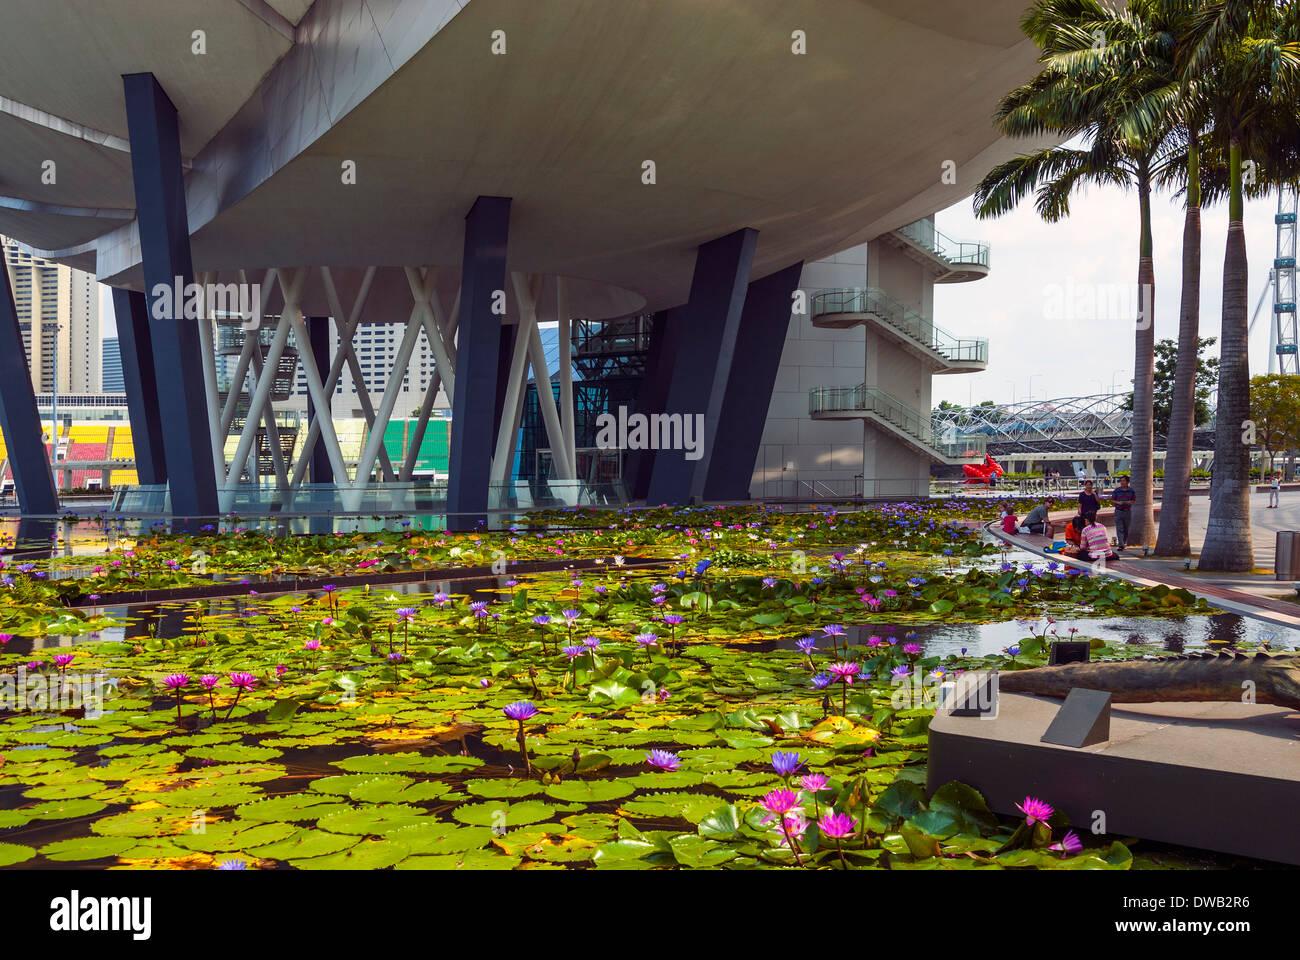 The Waterside Promenade, Marina Bay Sands, Singapore - Stock Image